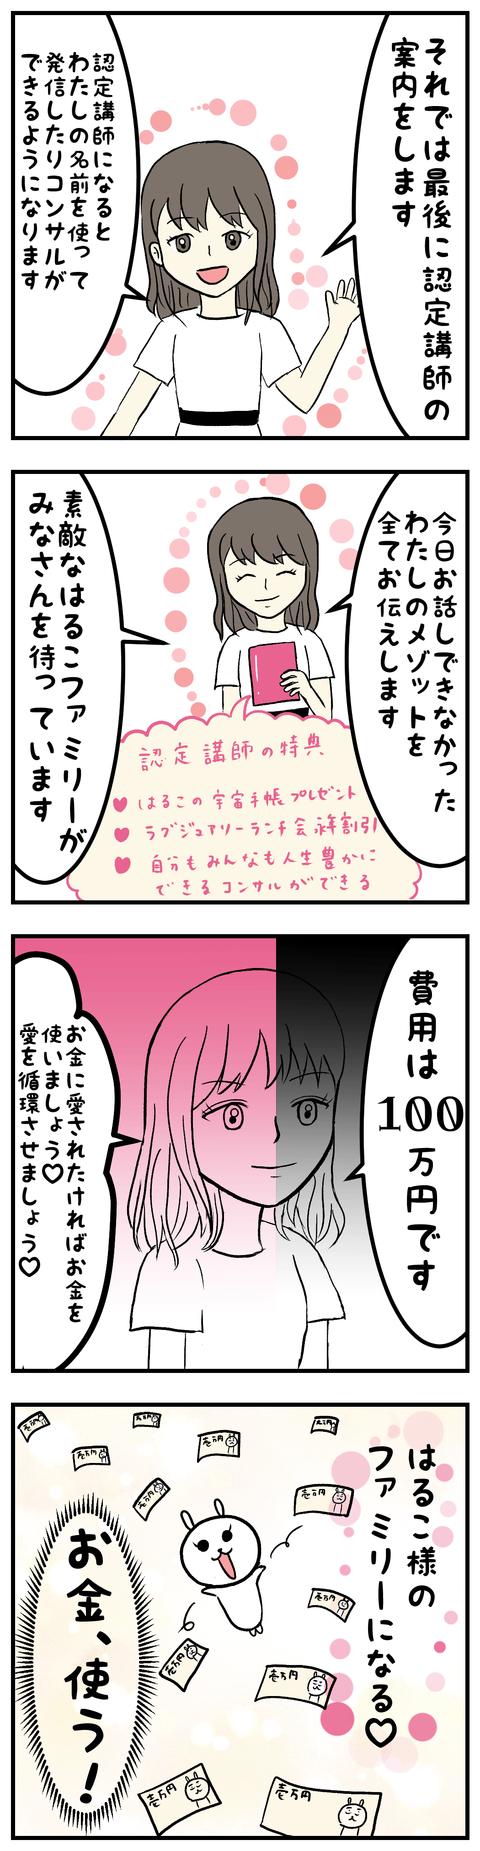 manga-yuzuporo07-1